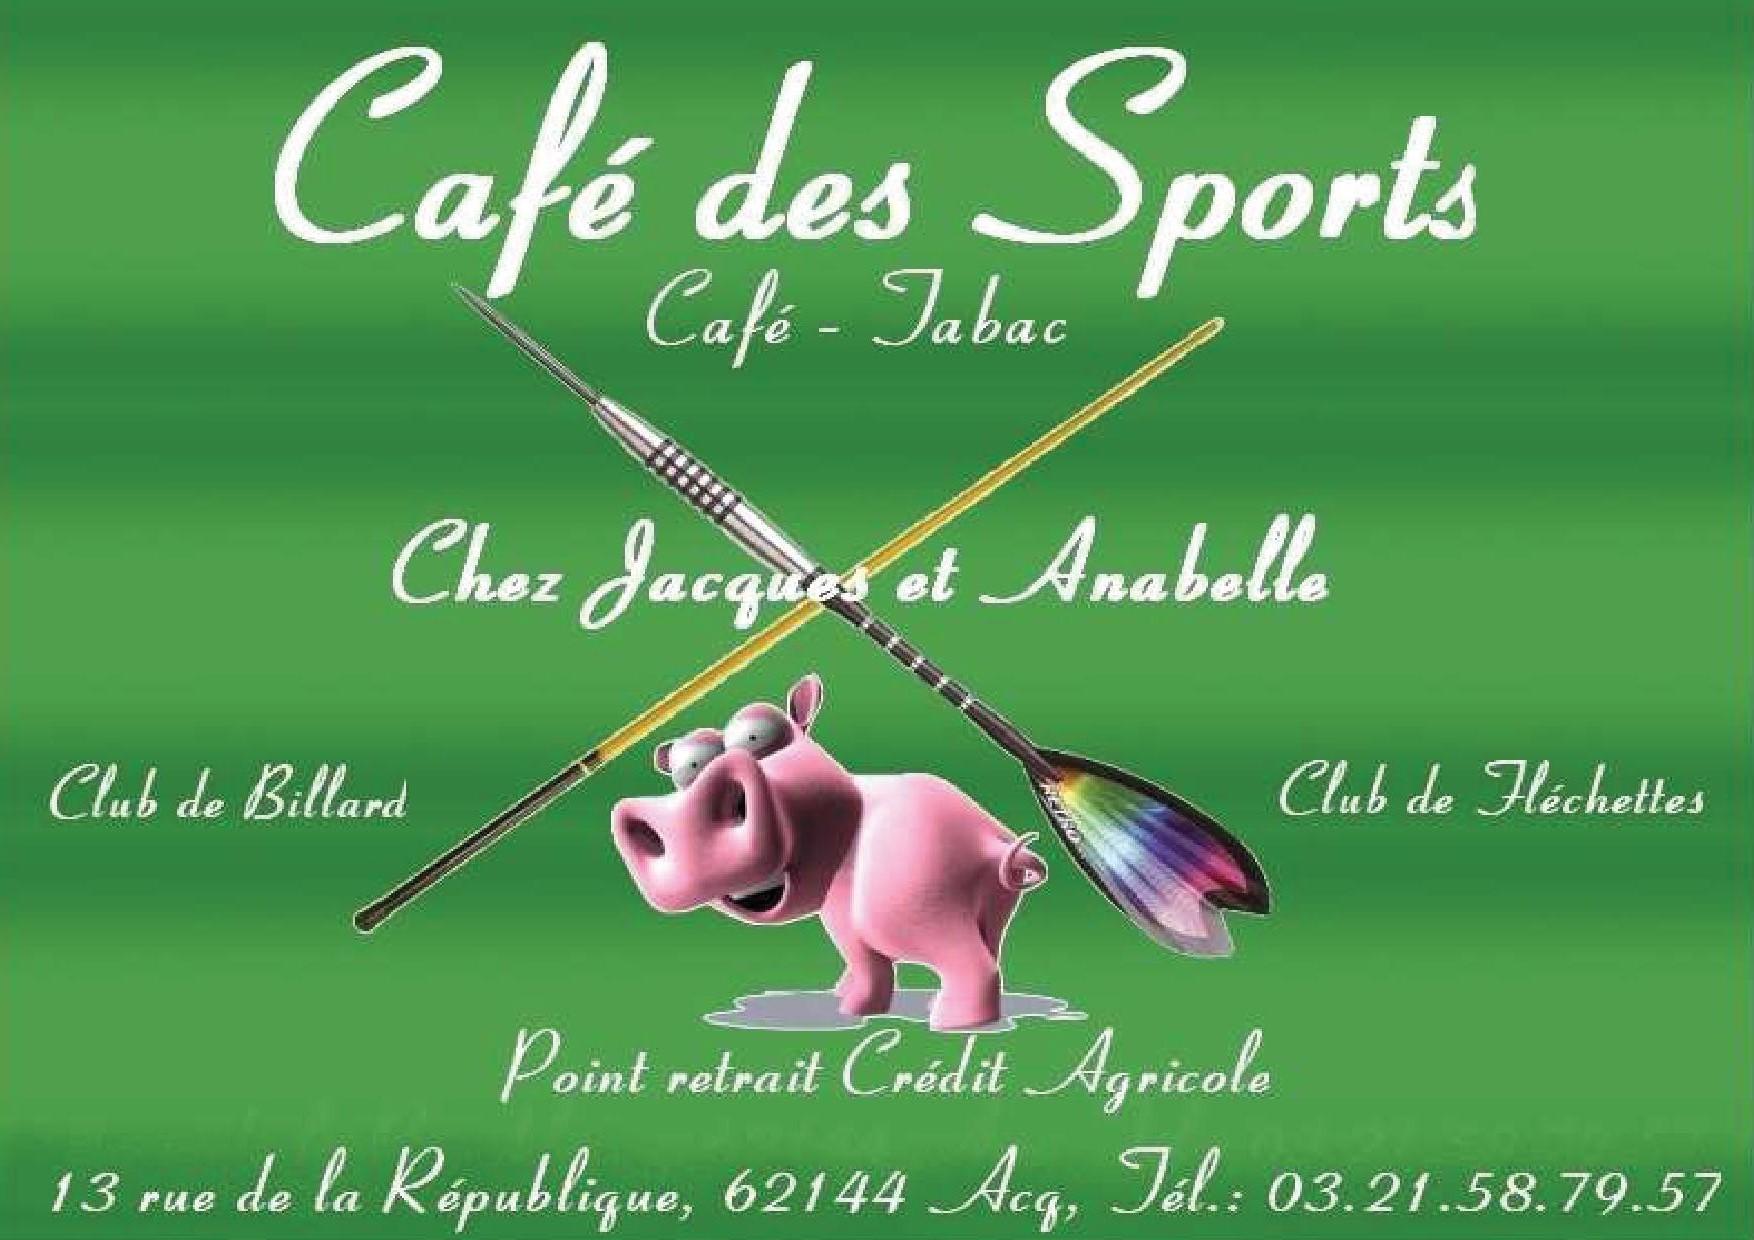 Café des sports.jpg